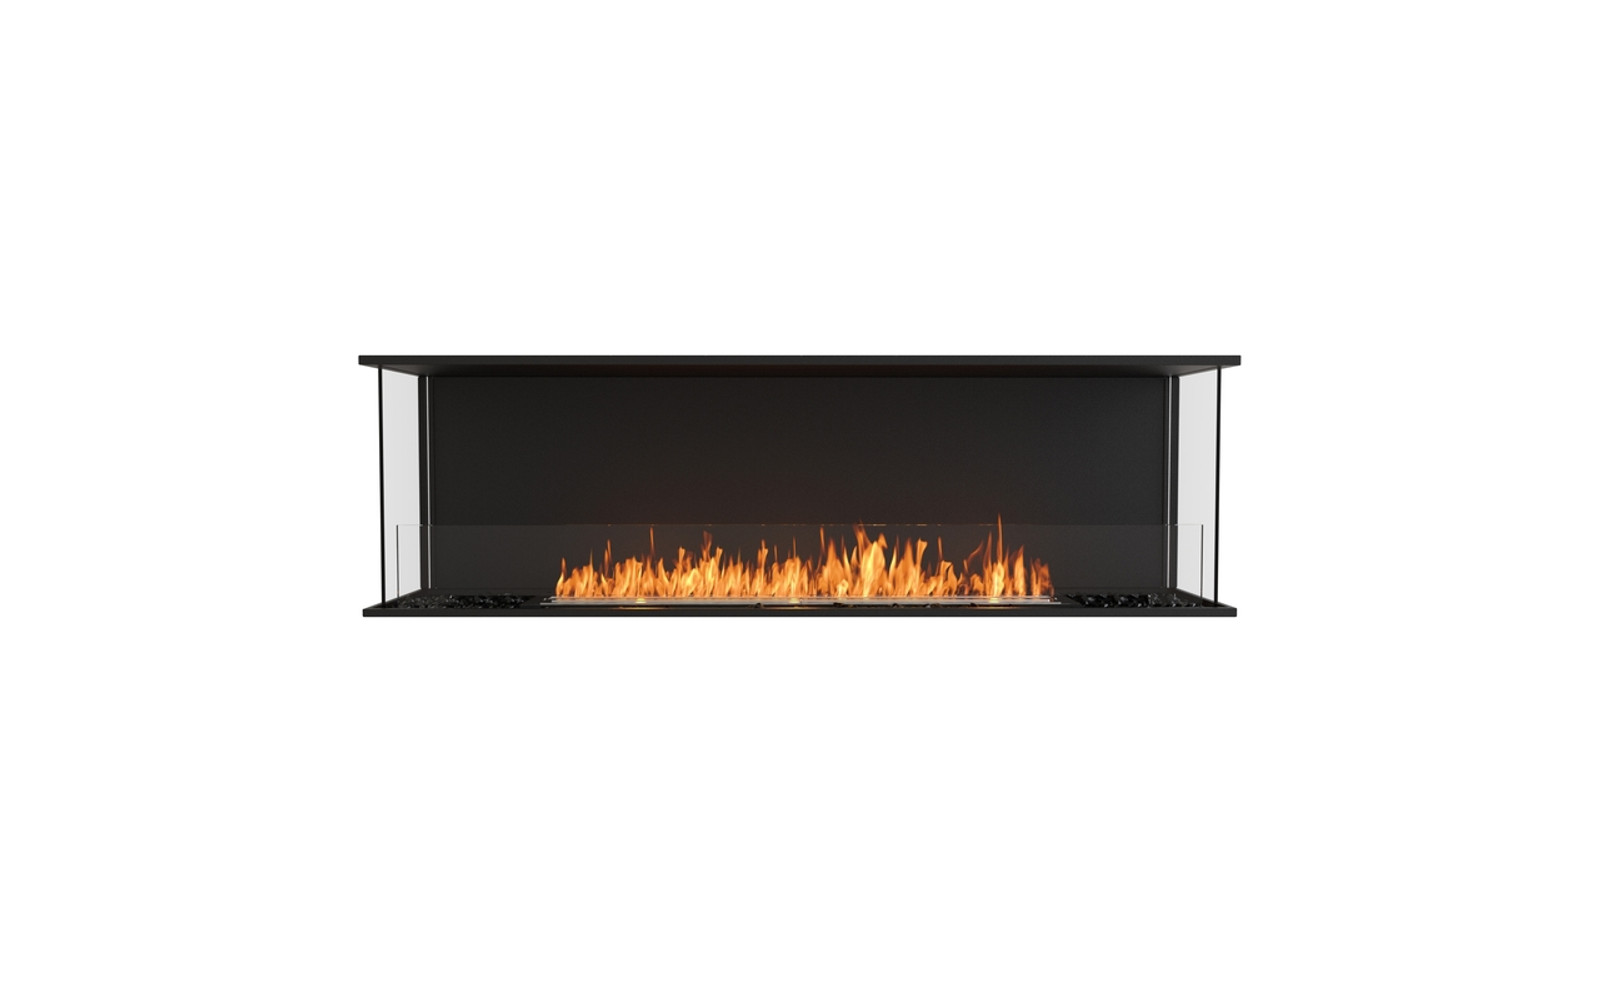 Flex Bay - All Flame